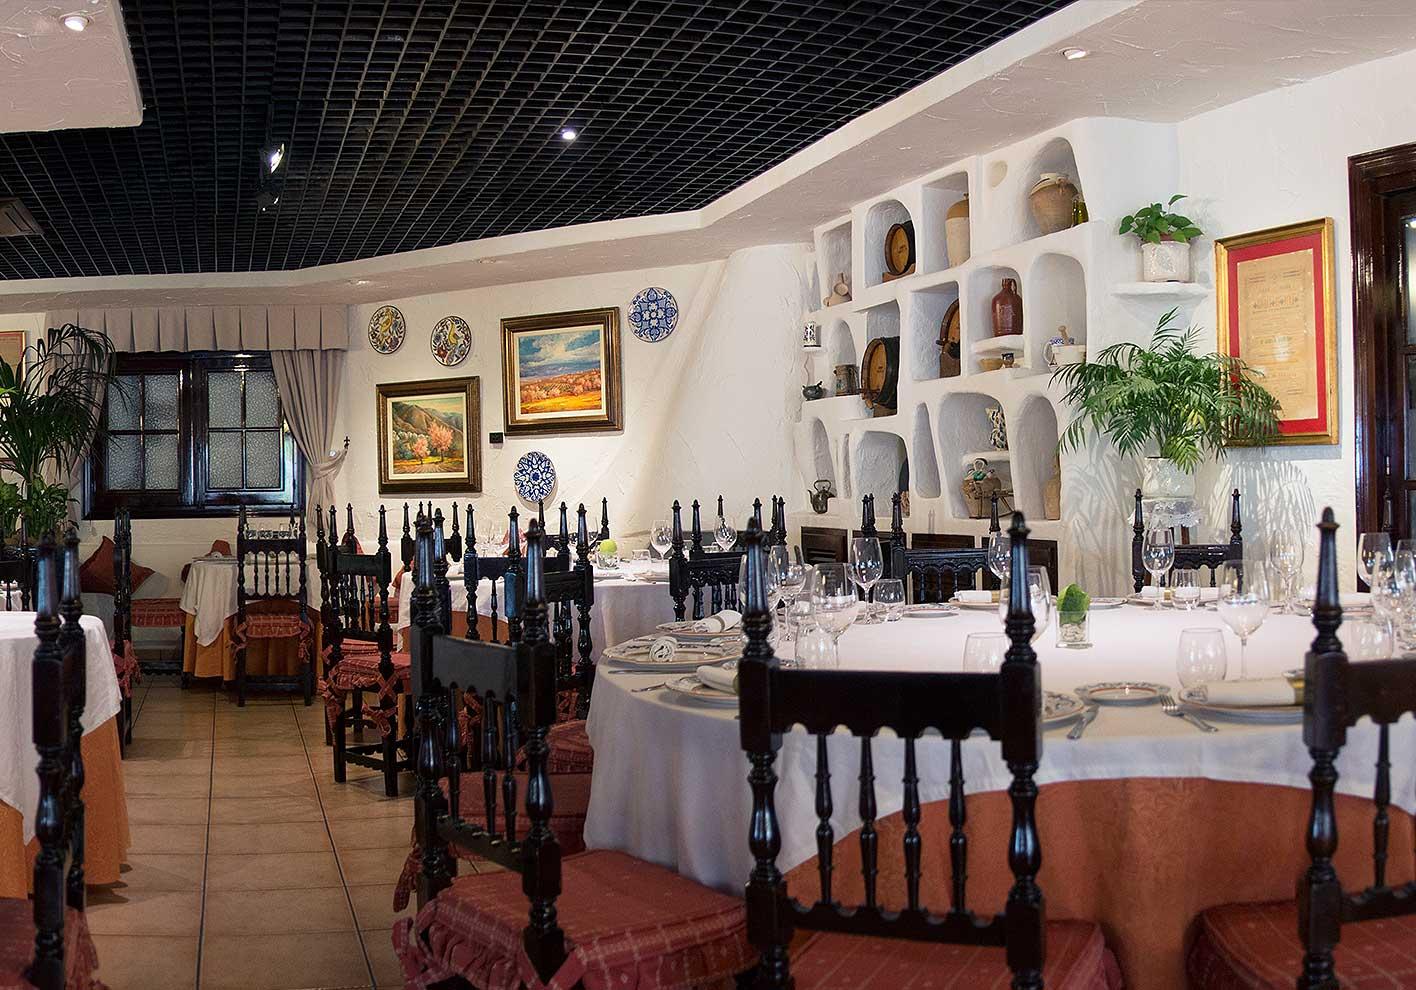 Main Dining Room 05   Hotel Restaurante Terraza Carmona In Vera, Almeria